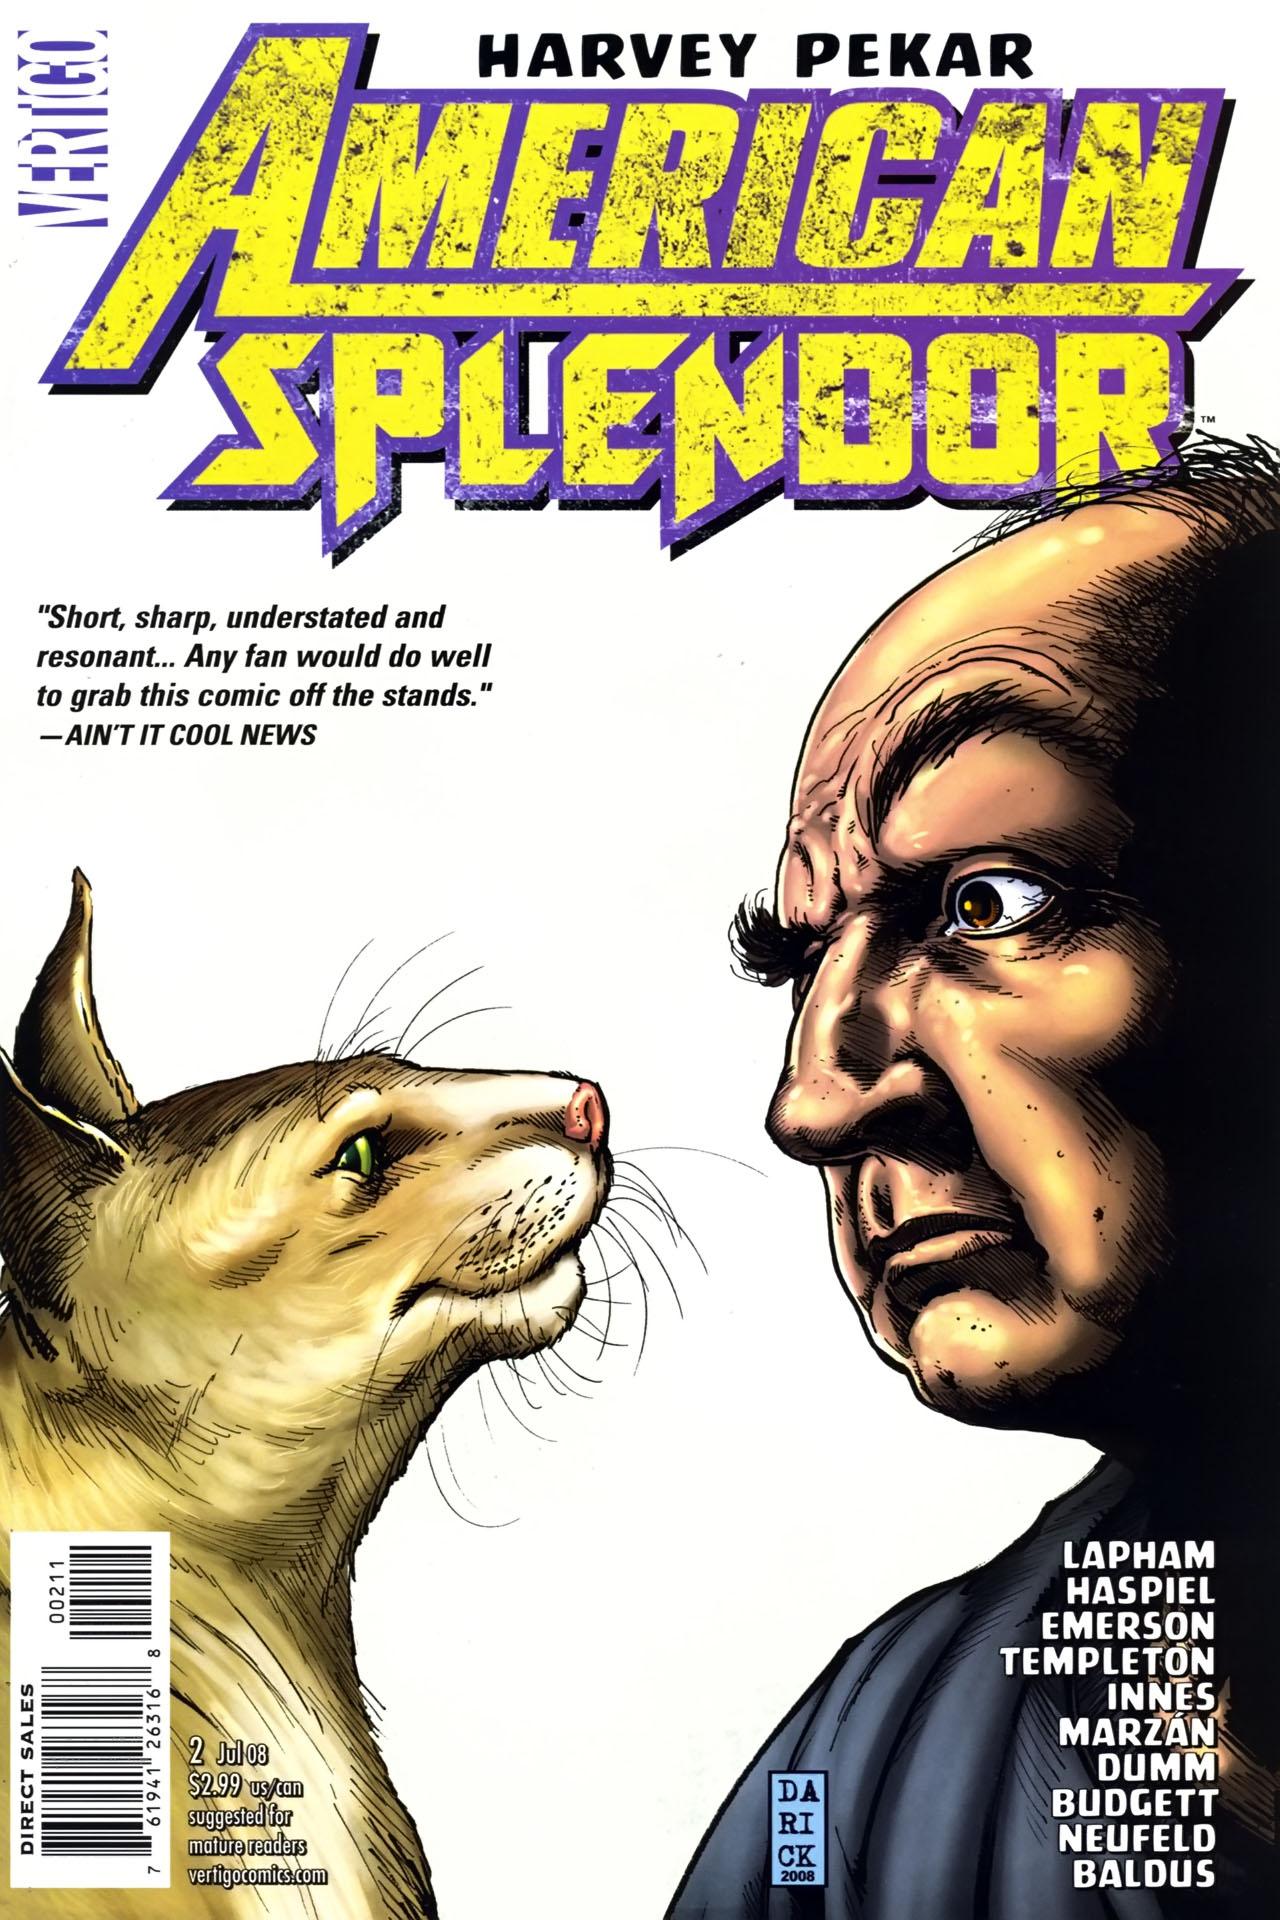 American Splendor (2008) 2 Page 1